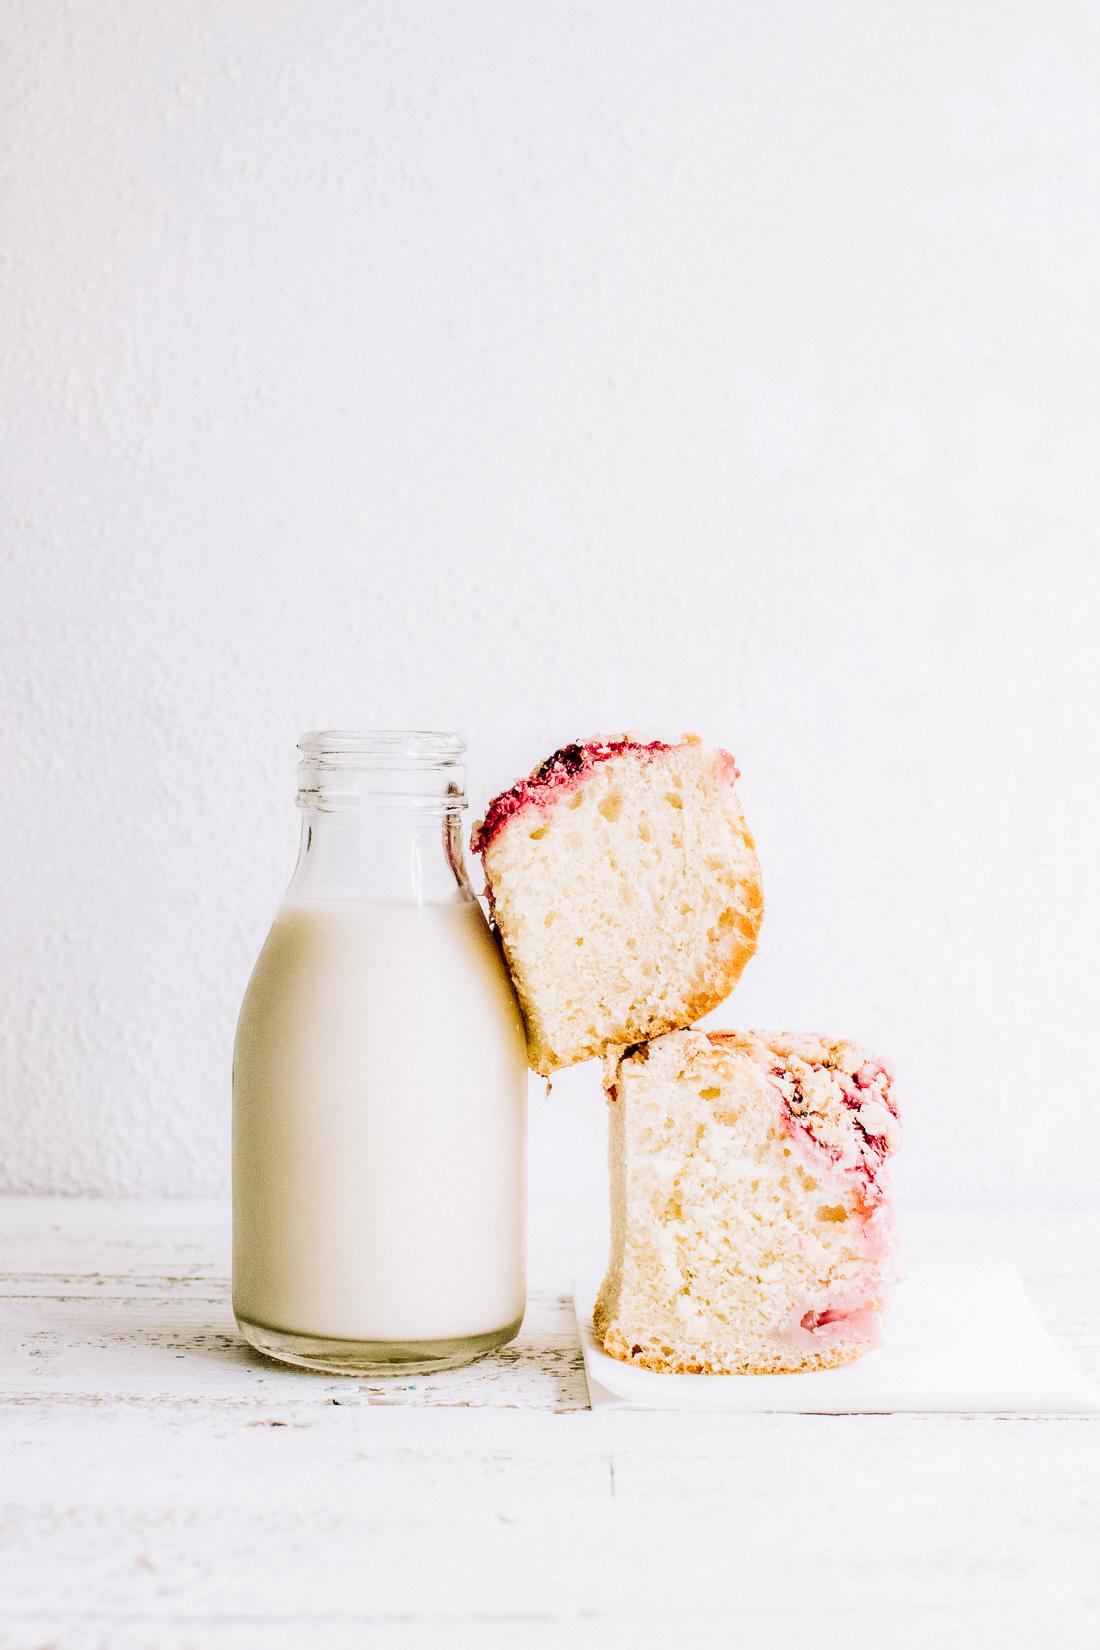 homemade-buttermilk-recipe